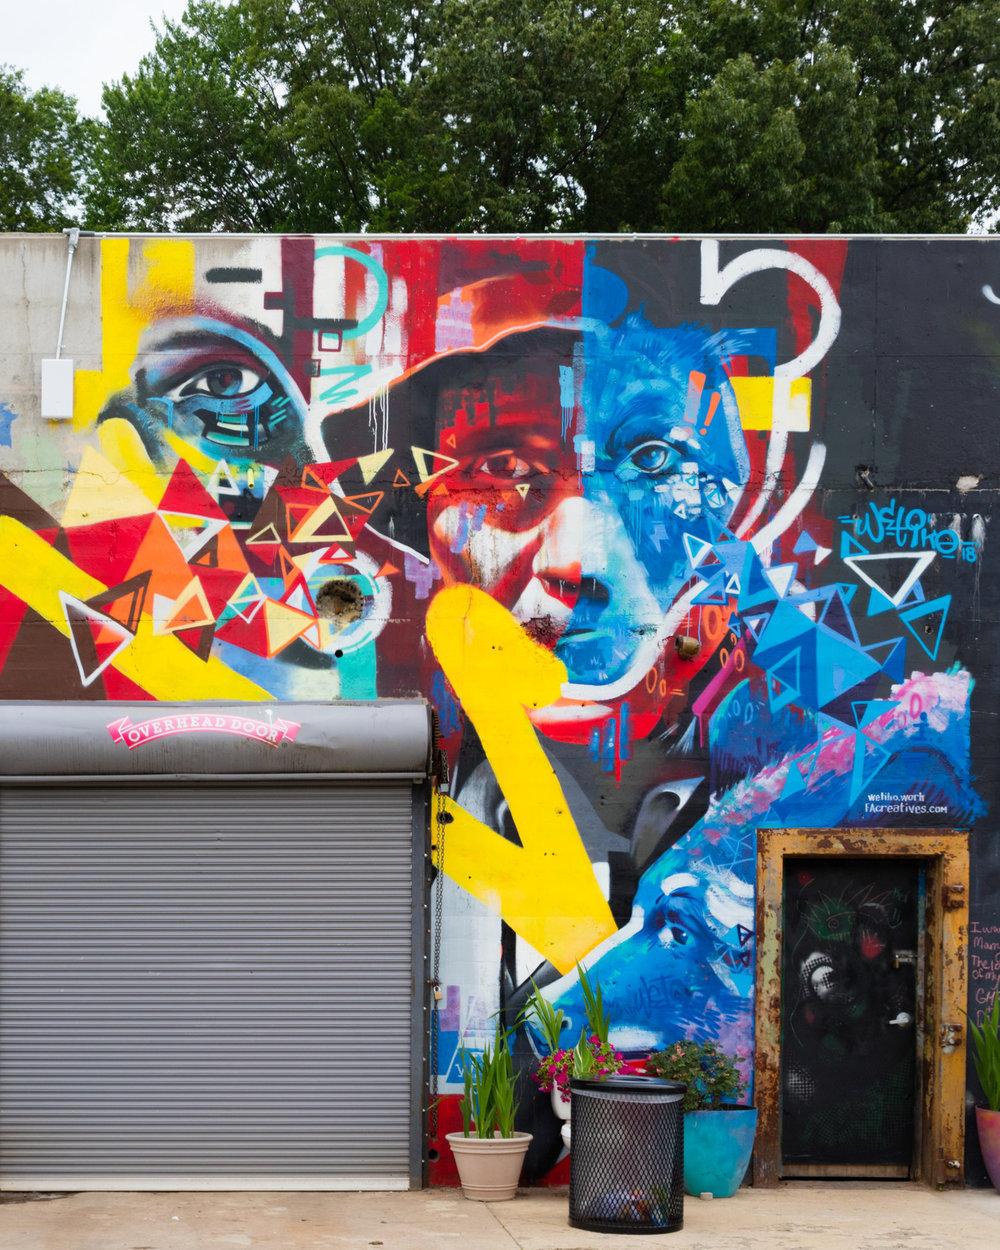 IX Art Park Mural Wetiko Charlottesville.jpg